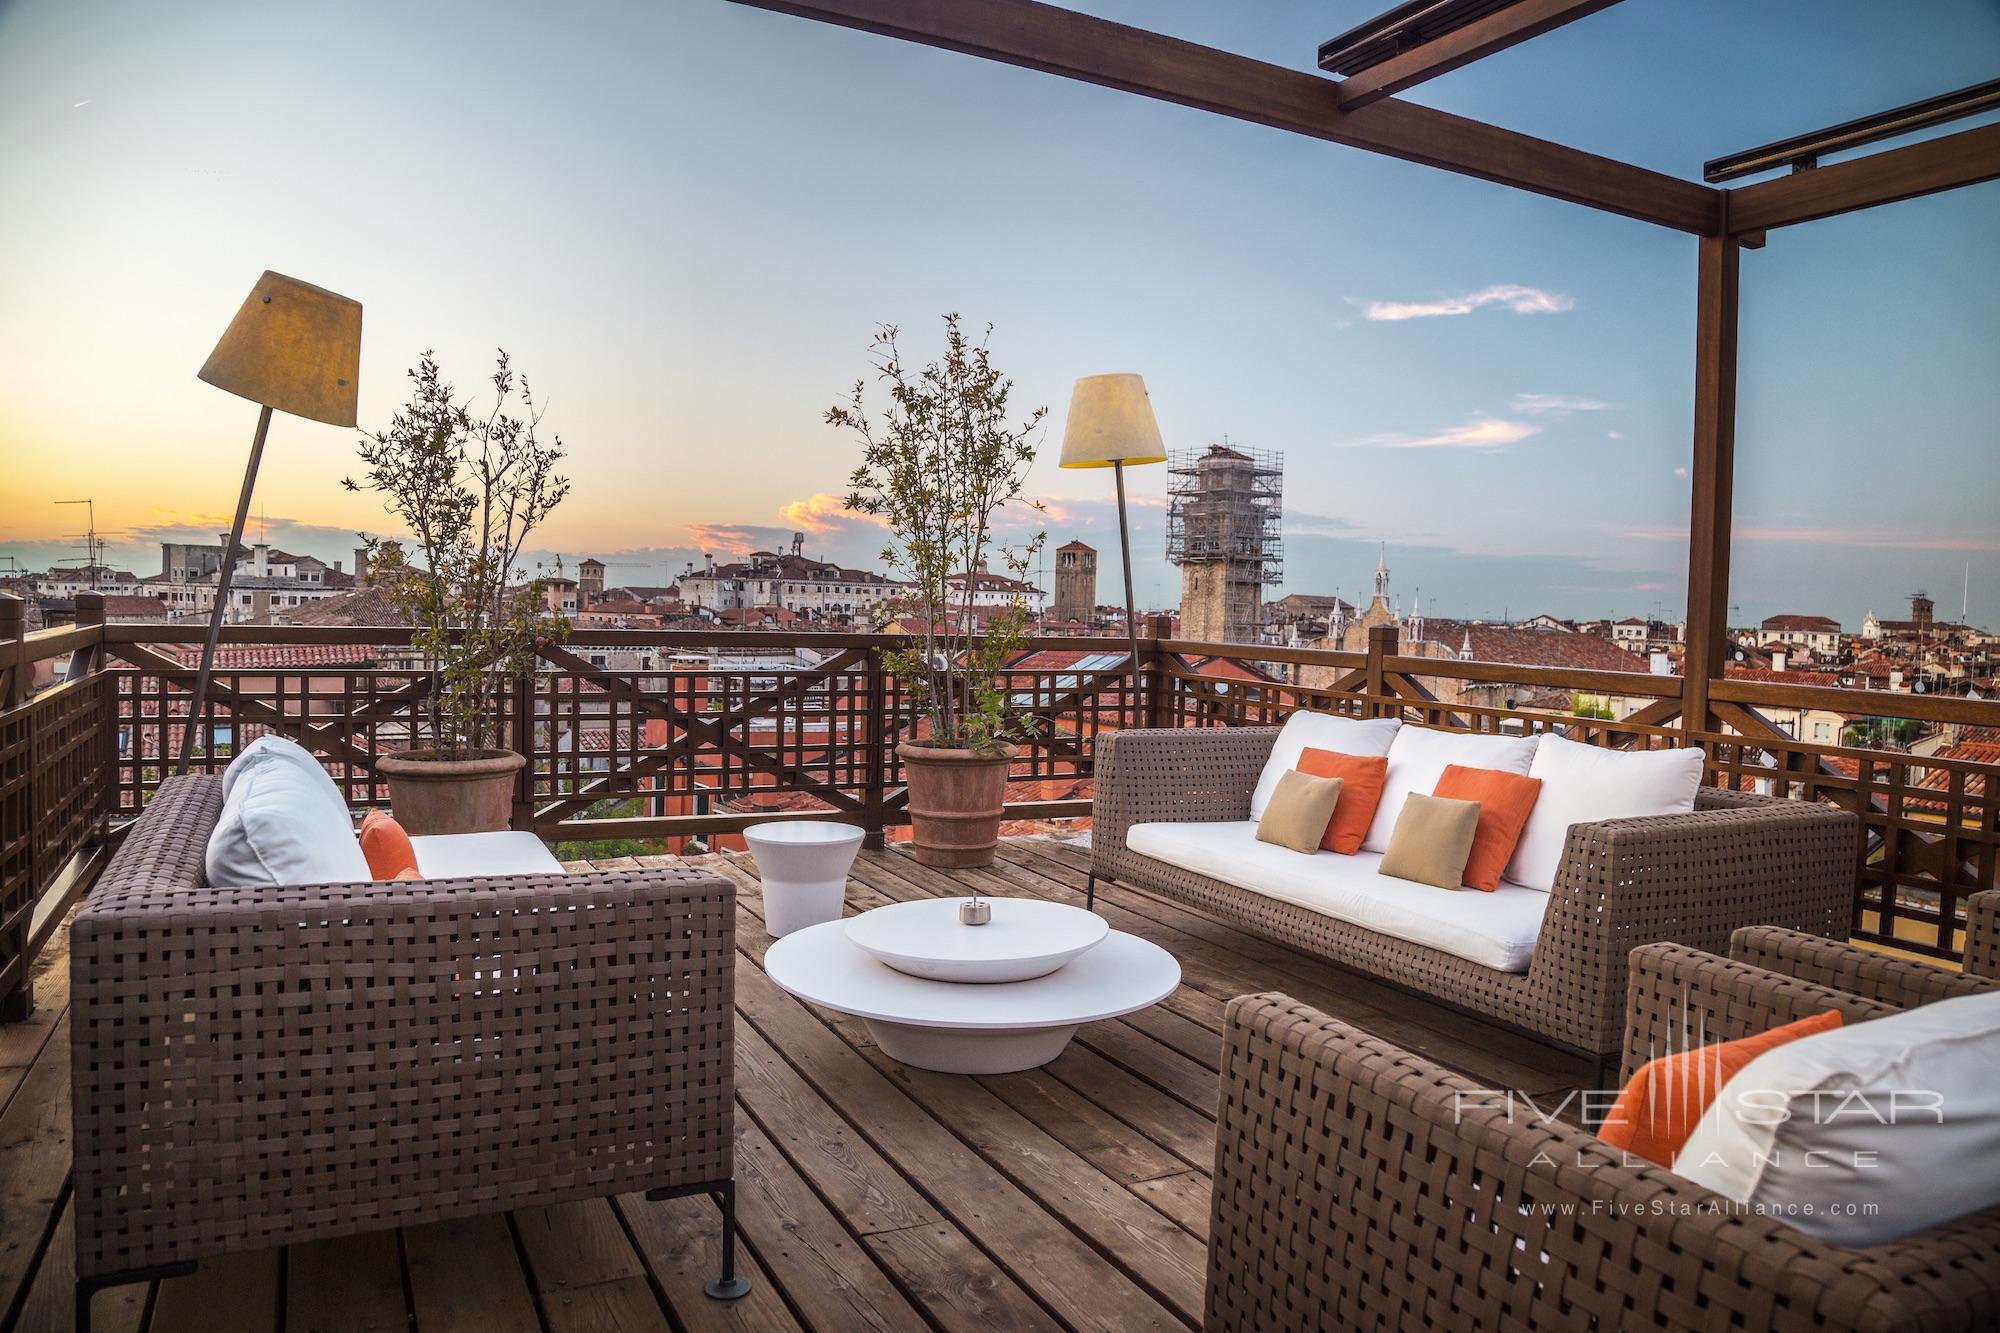 Rooftop Terrace at Aman Venice